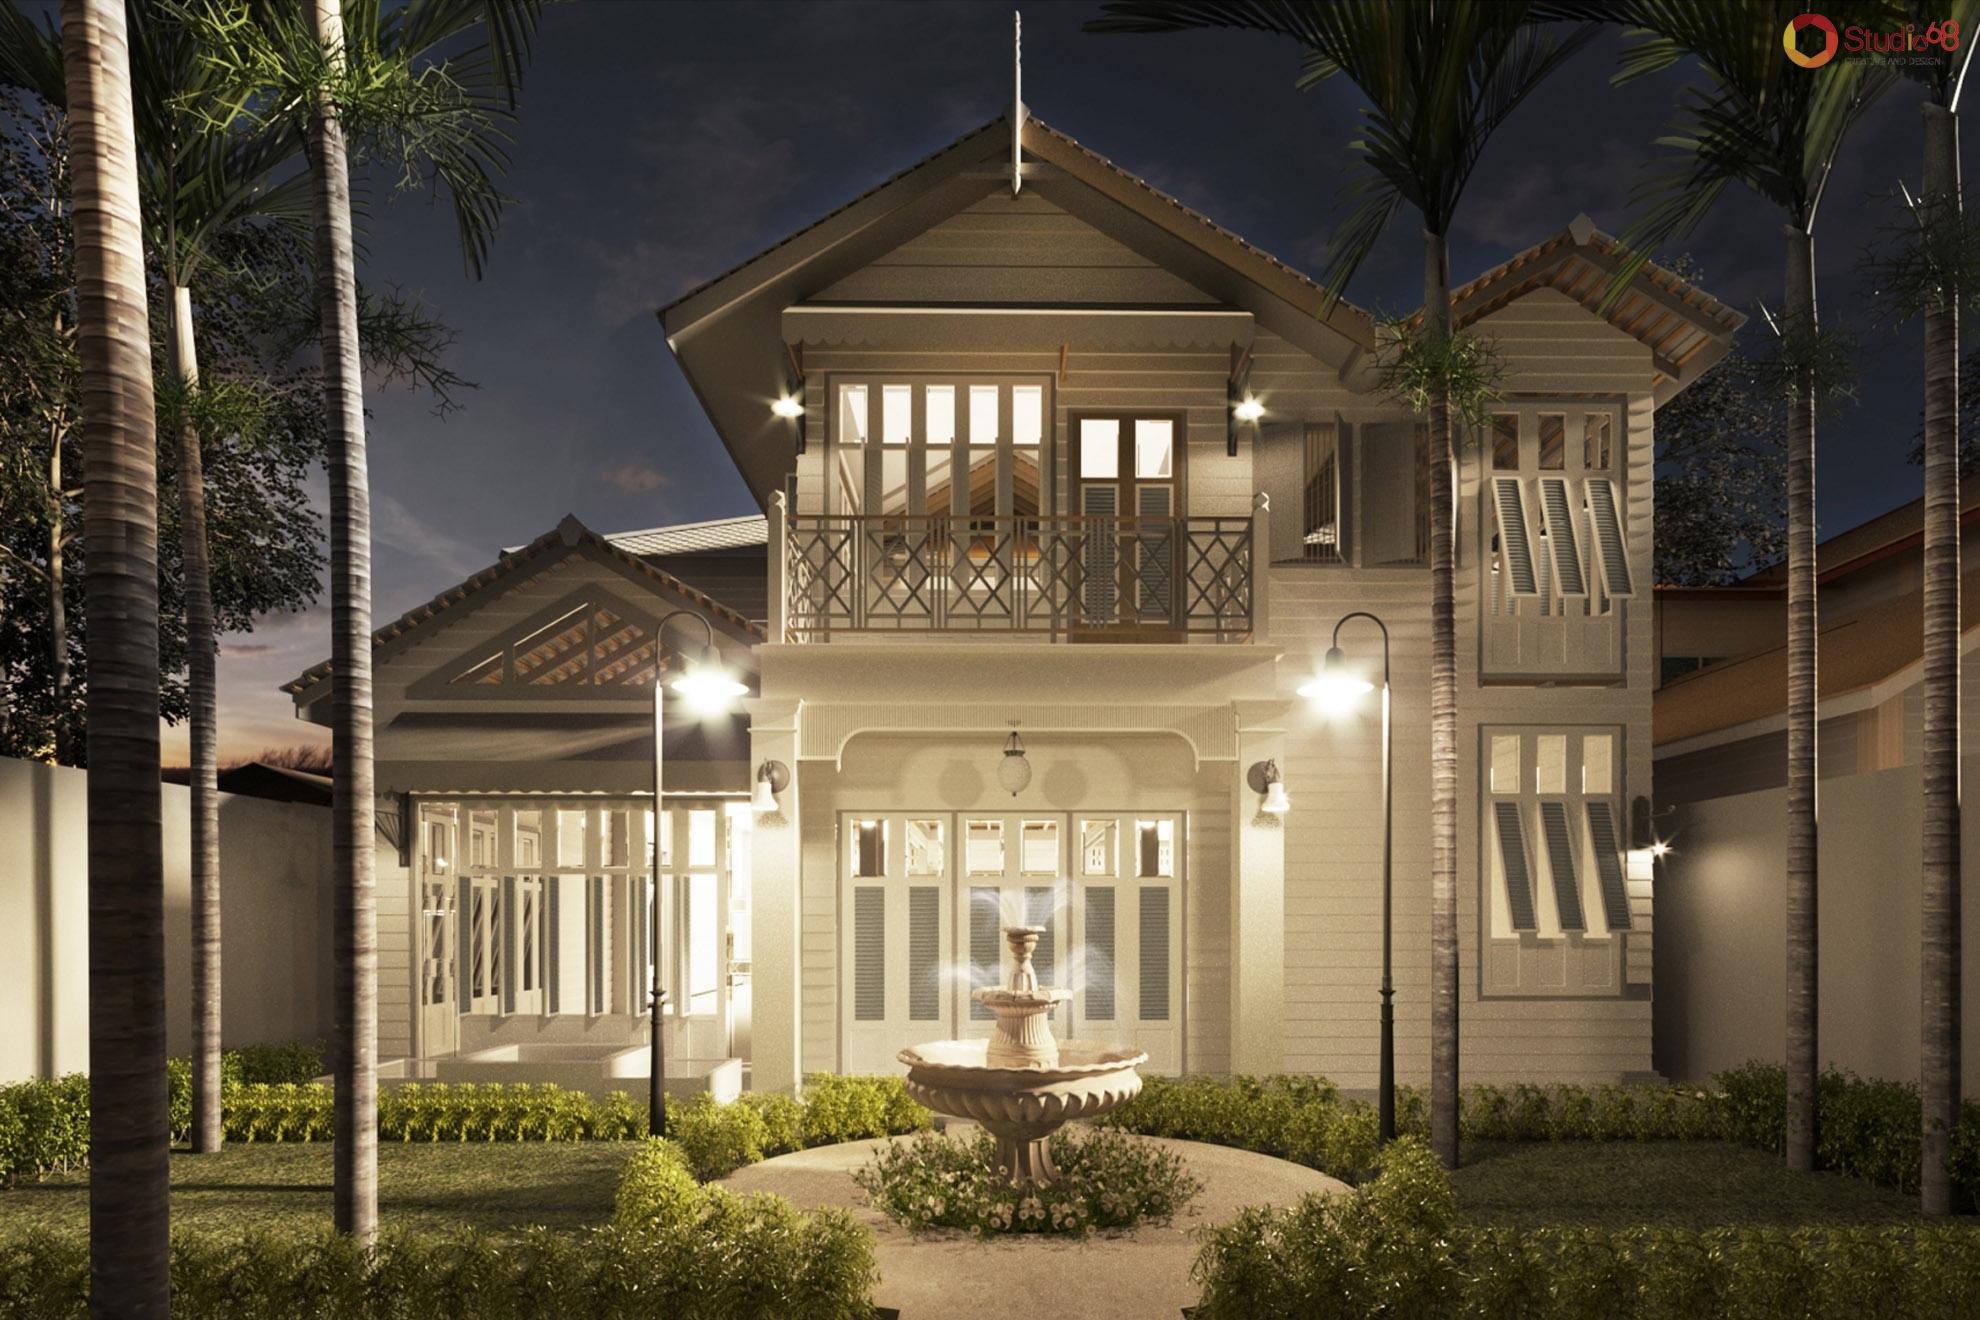 Wynn Villa รีโนเวลโรงแรม รีสอร์ท